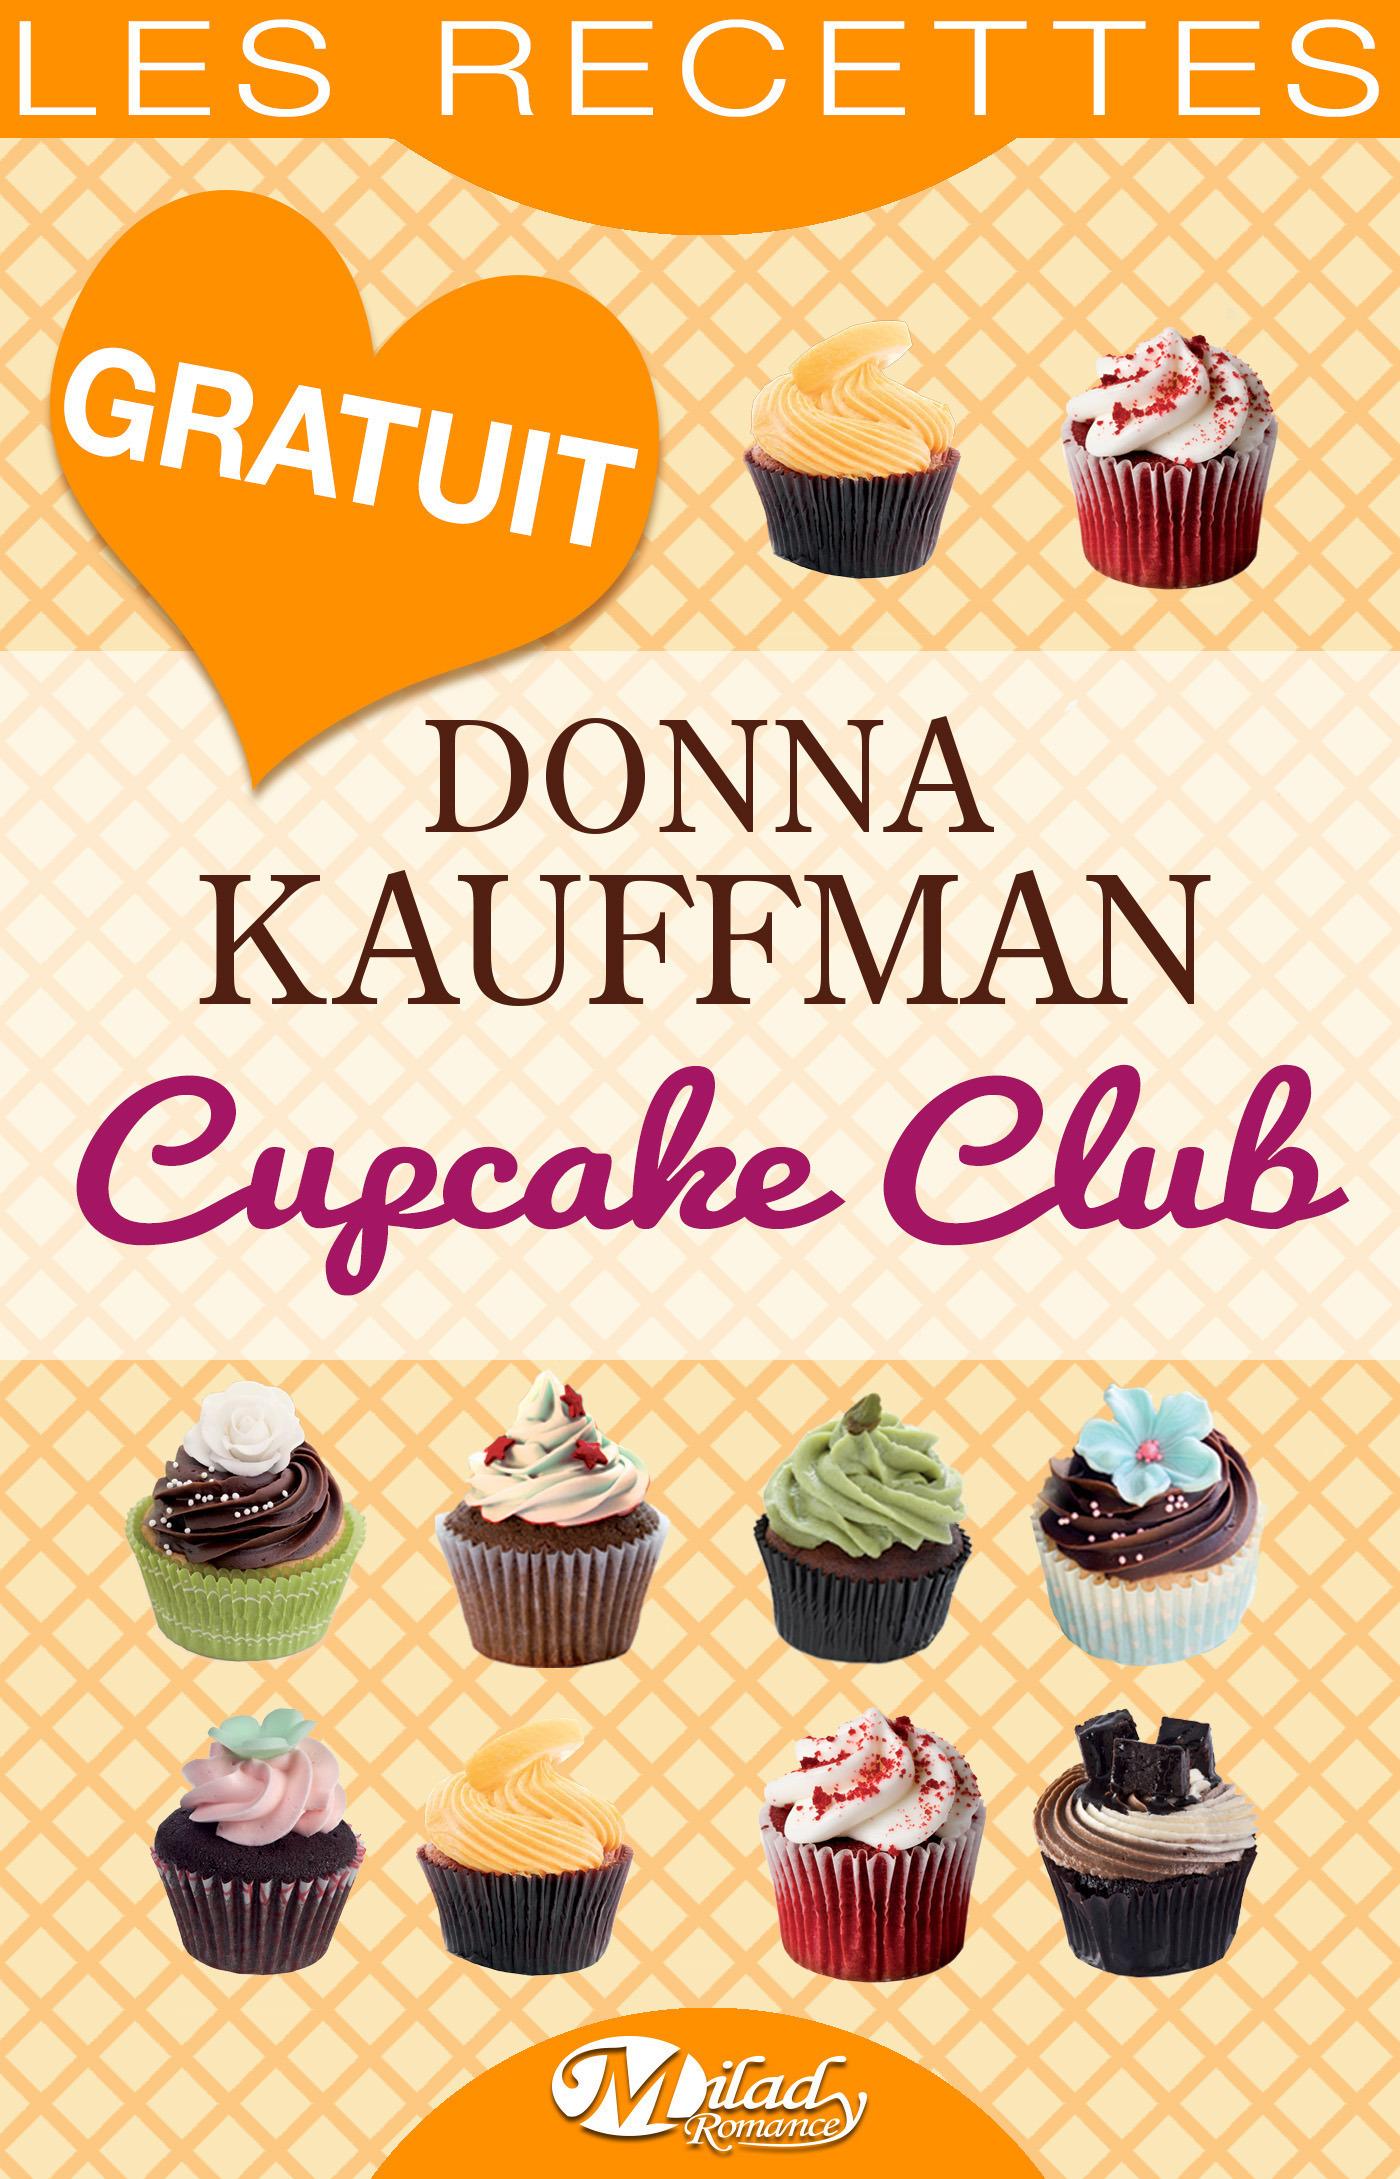 Cupcake Club ; les recettes